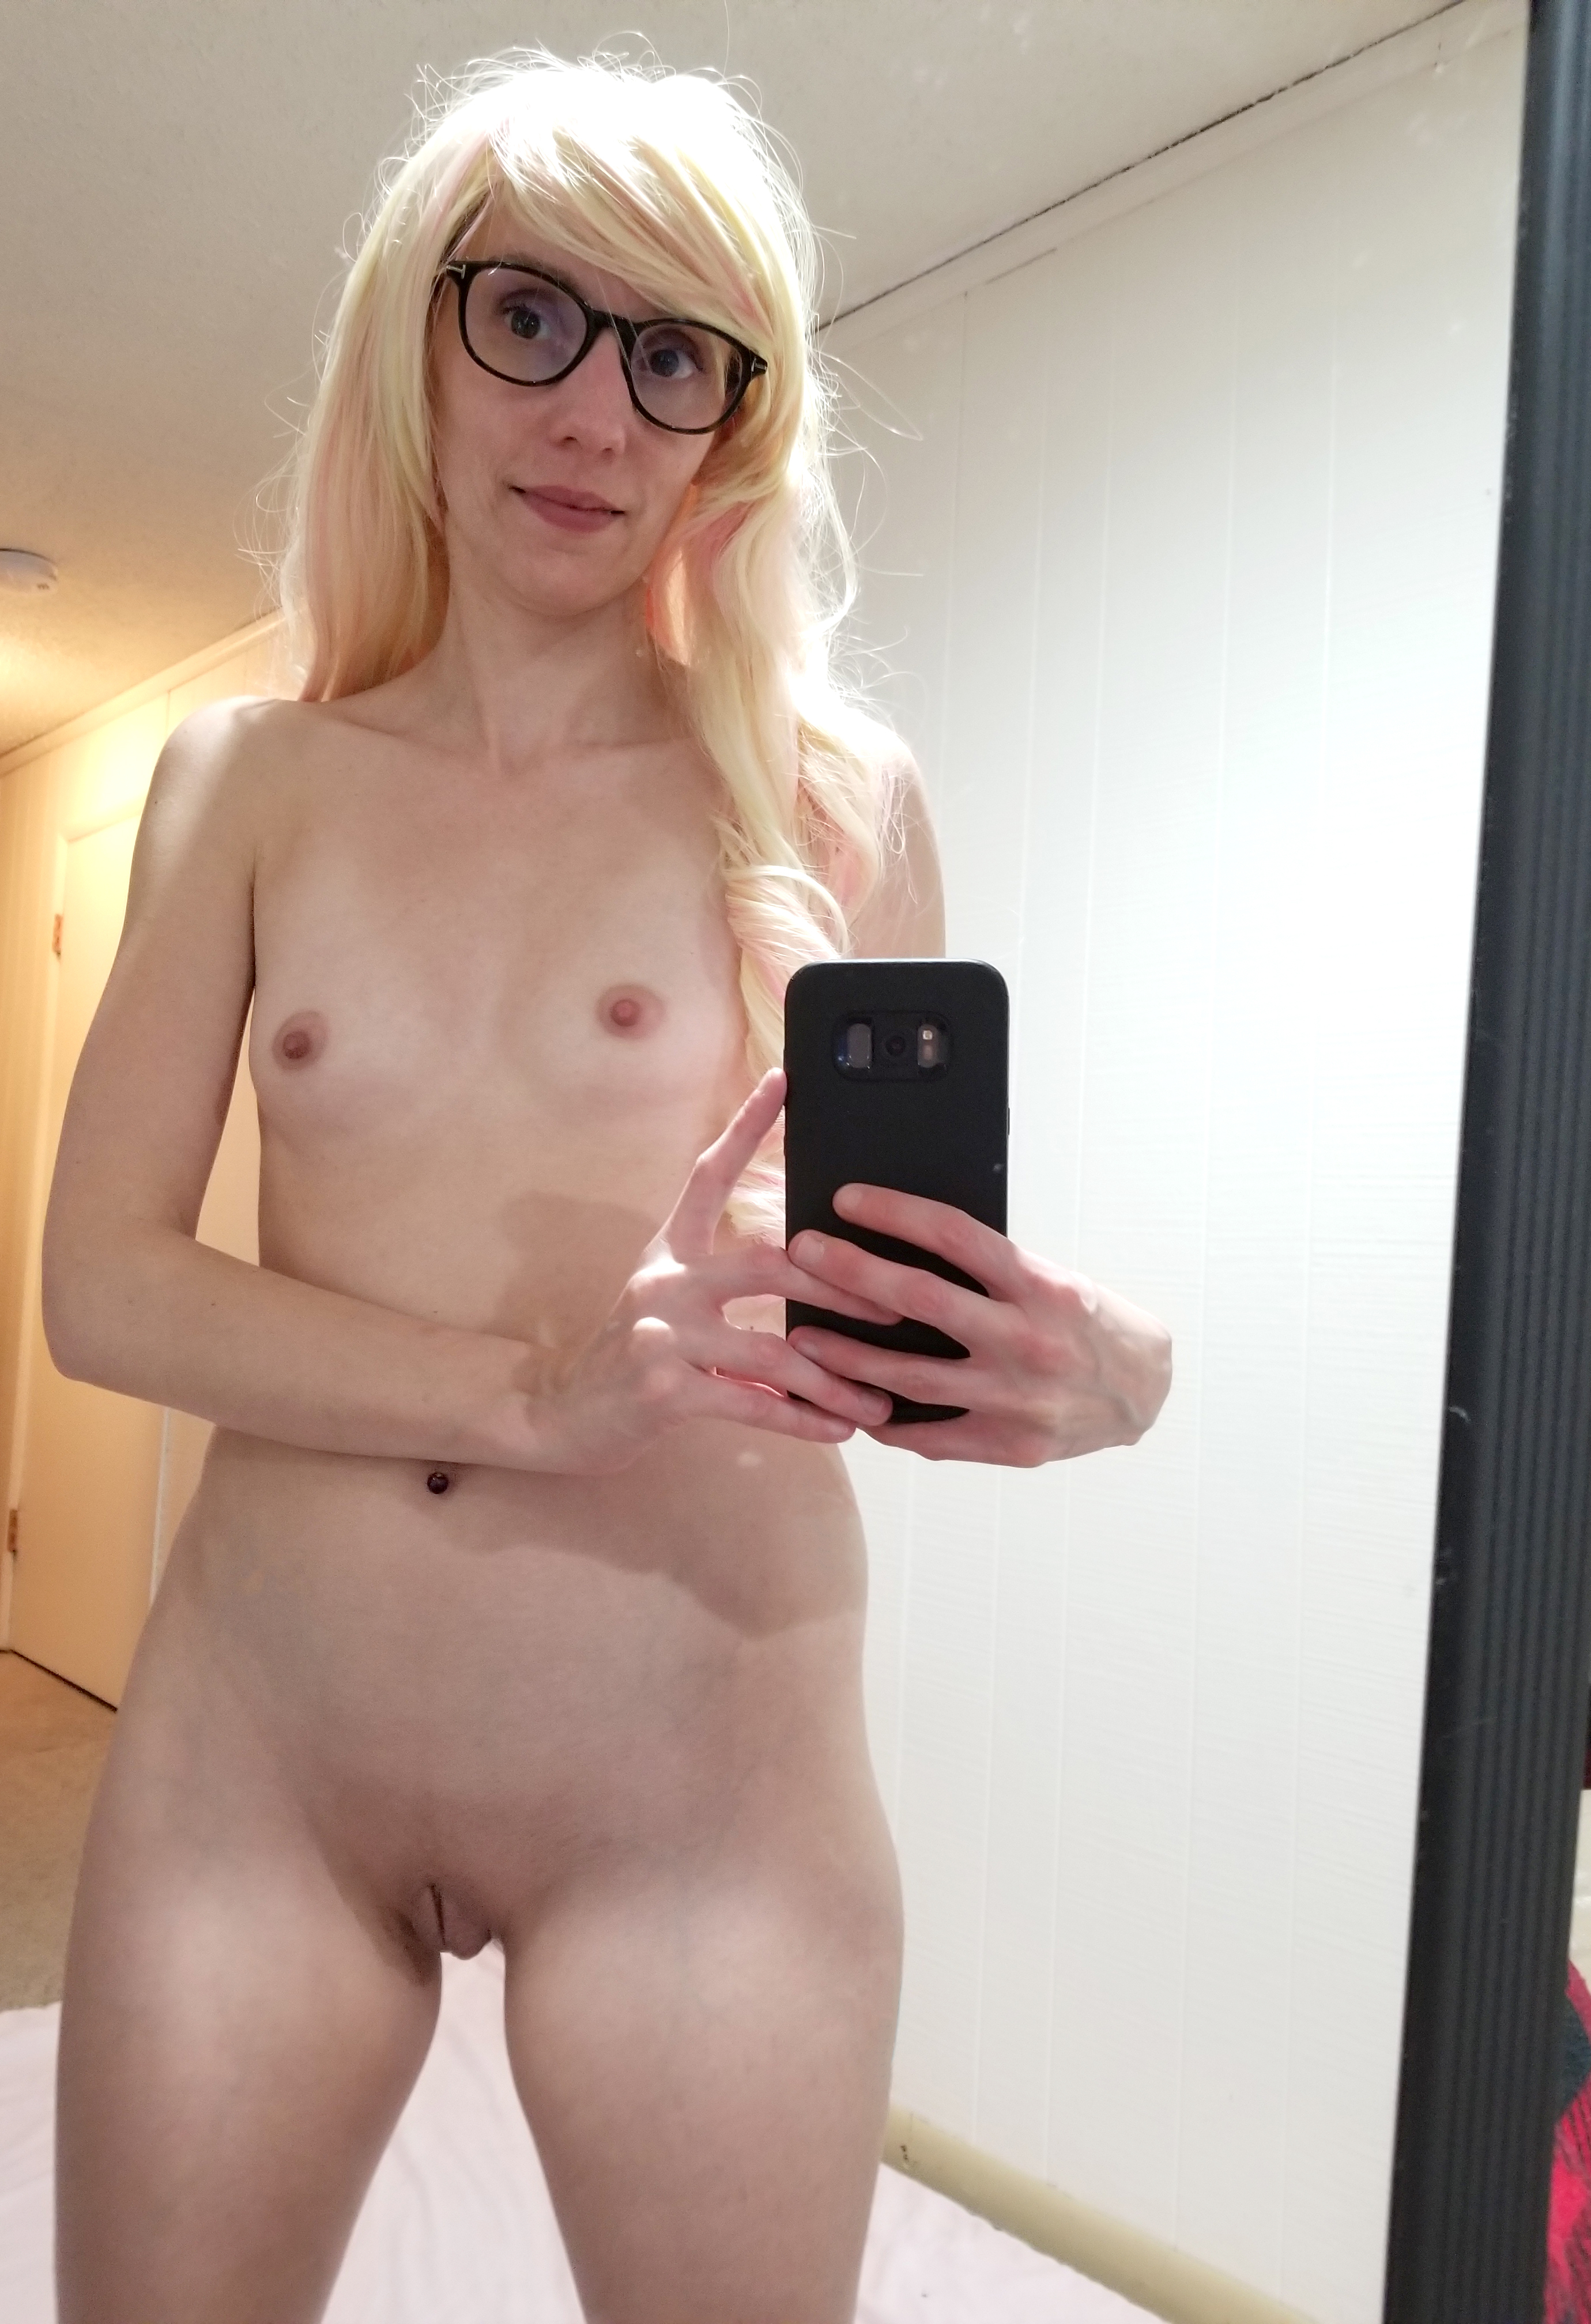 office christmas threesome free christmas threesome #glasses #plainjane #nerd #skinny #smalltits #acup #selfie #amateur #blonde #mirrorshot